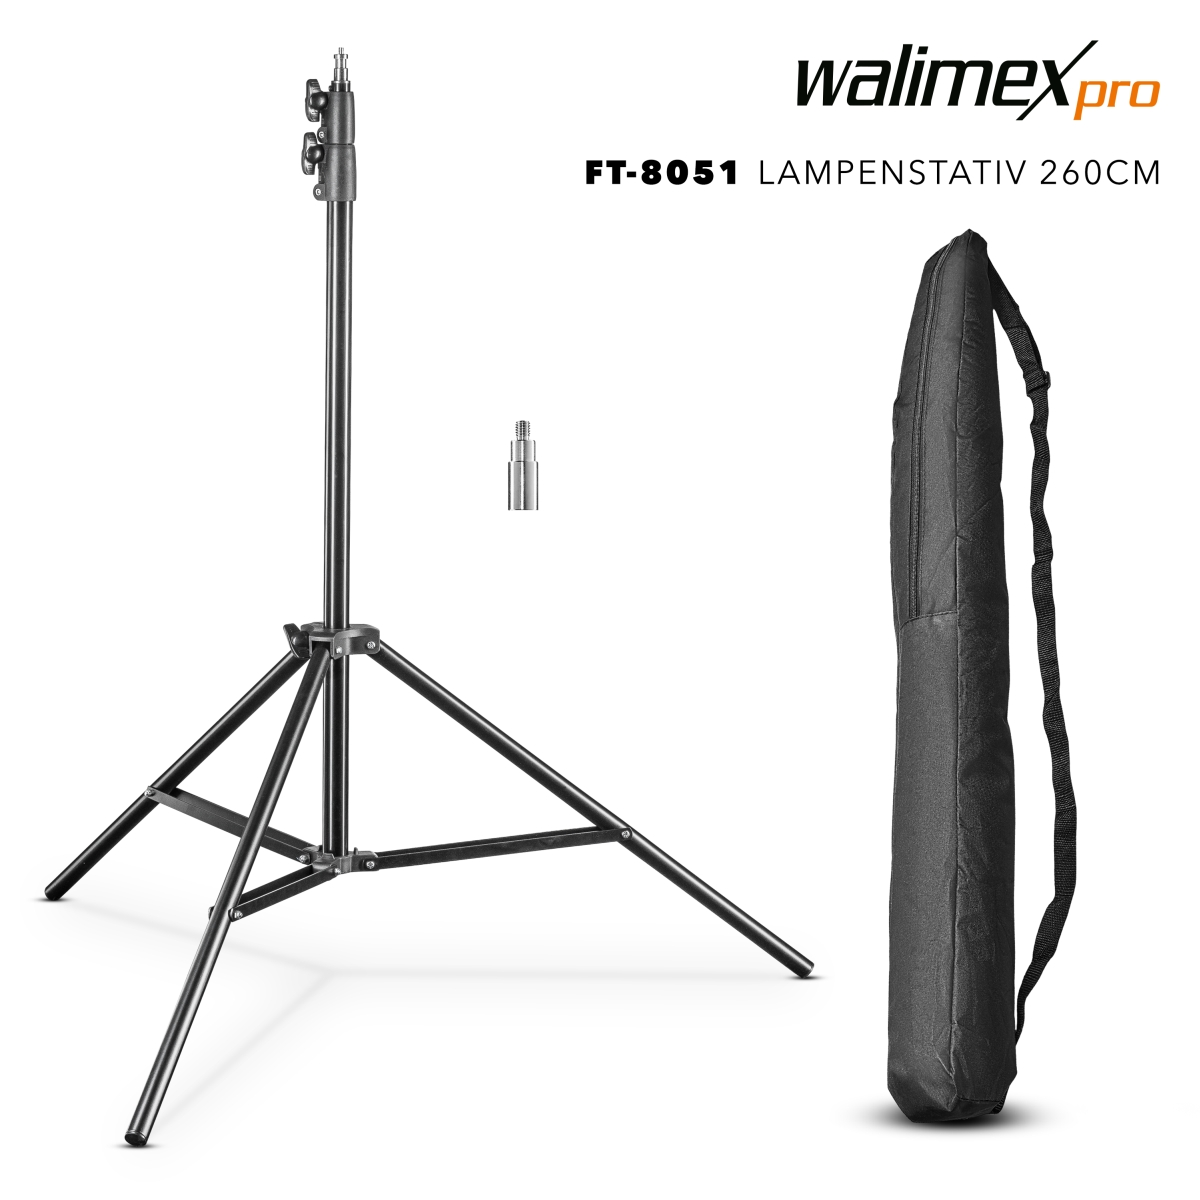 Walimex pro FT-8051 Lamp Tripod, 260cm